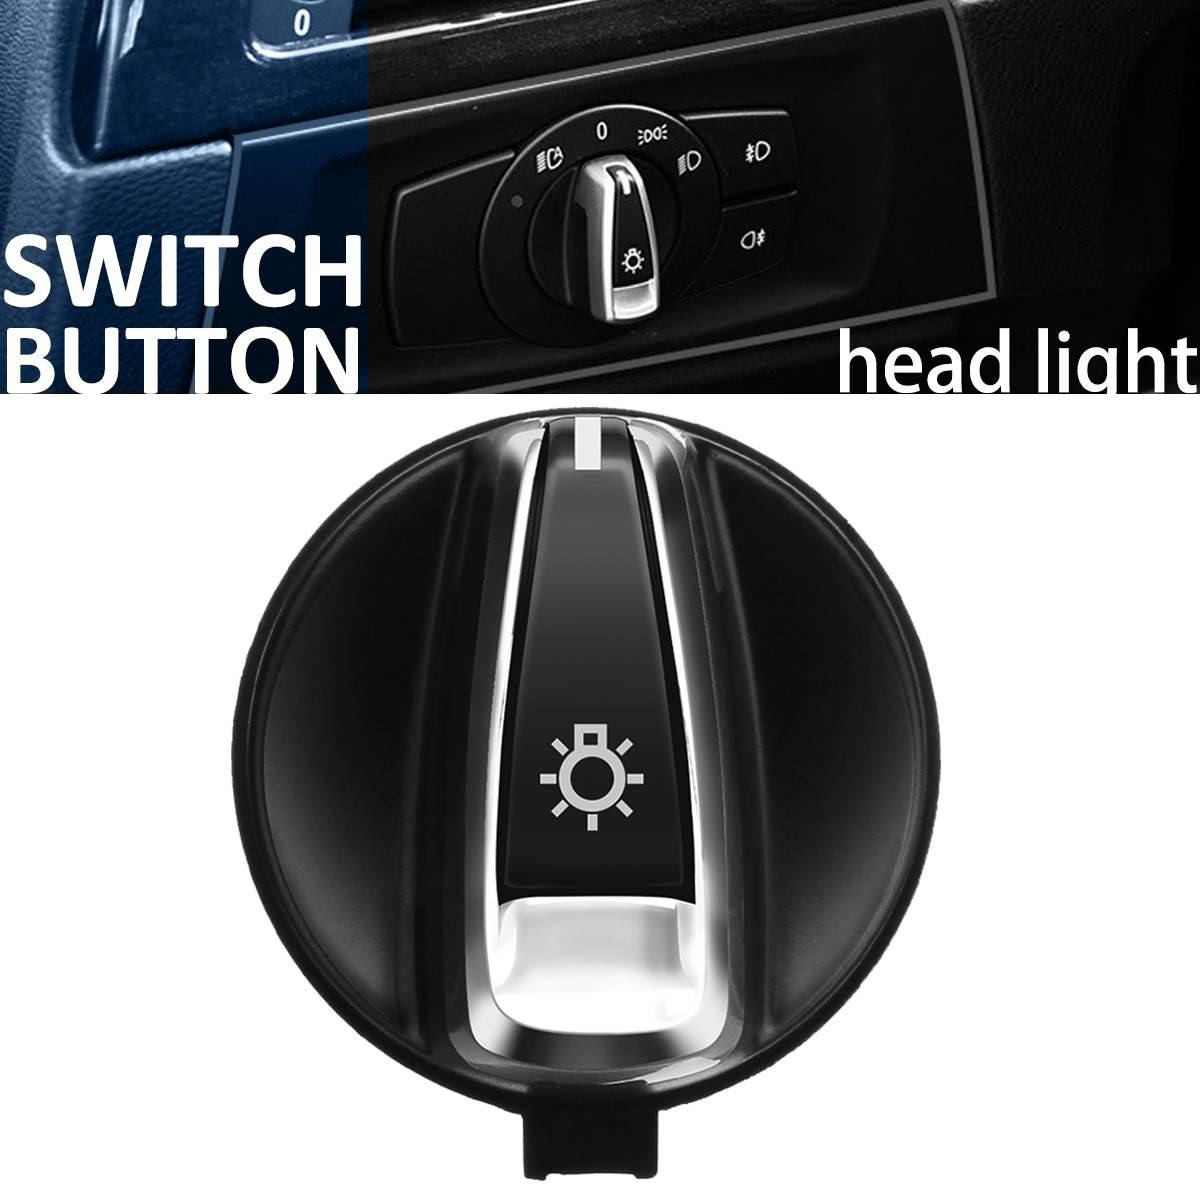 Car AUTO Front Head Light Switch Rotation Button For BMW 1 E88 E82 3 E90 E91 X1 E84 Head Light Lamp Switch Control Konb Button